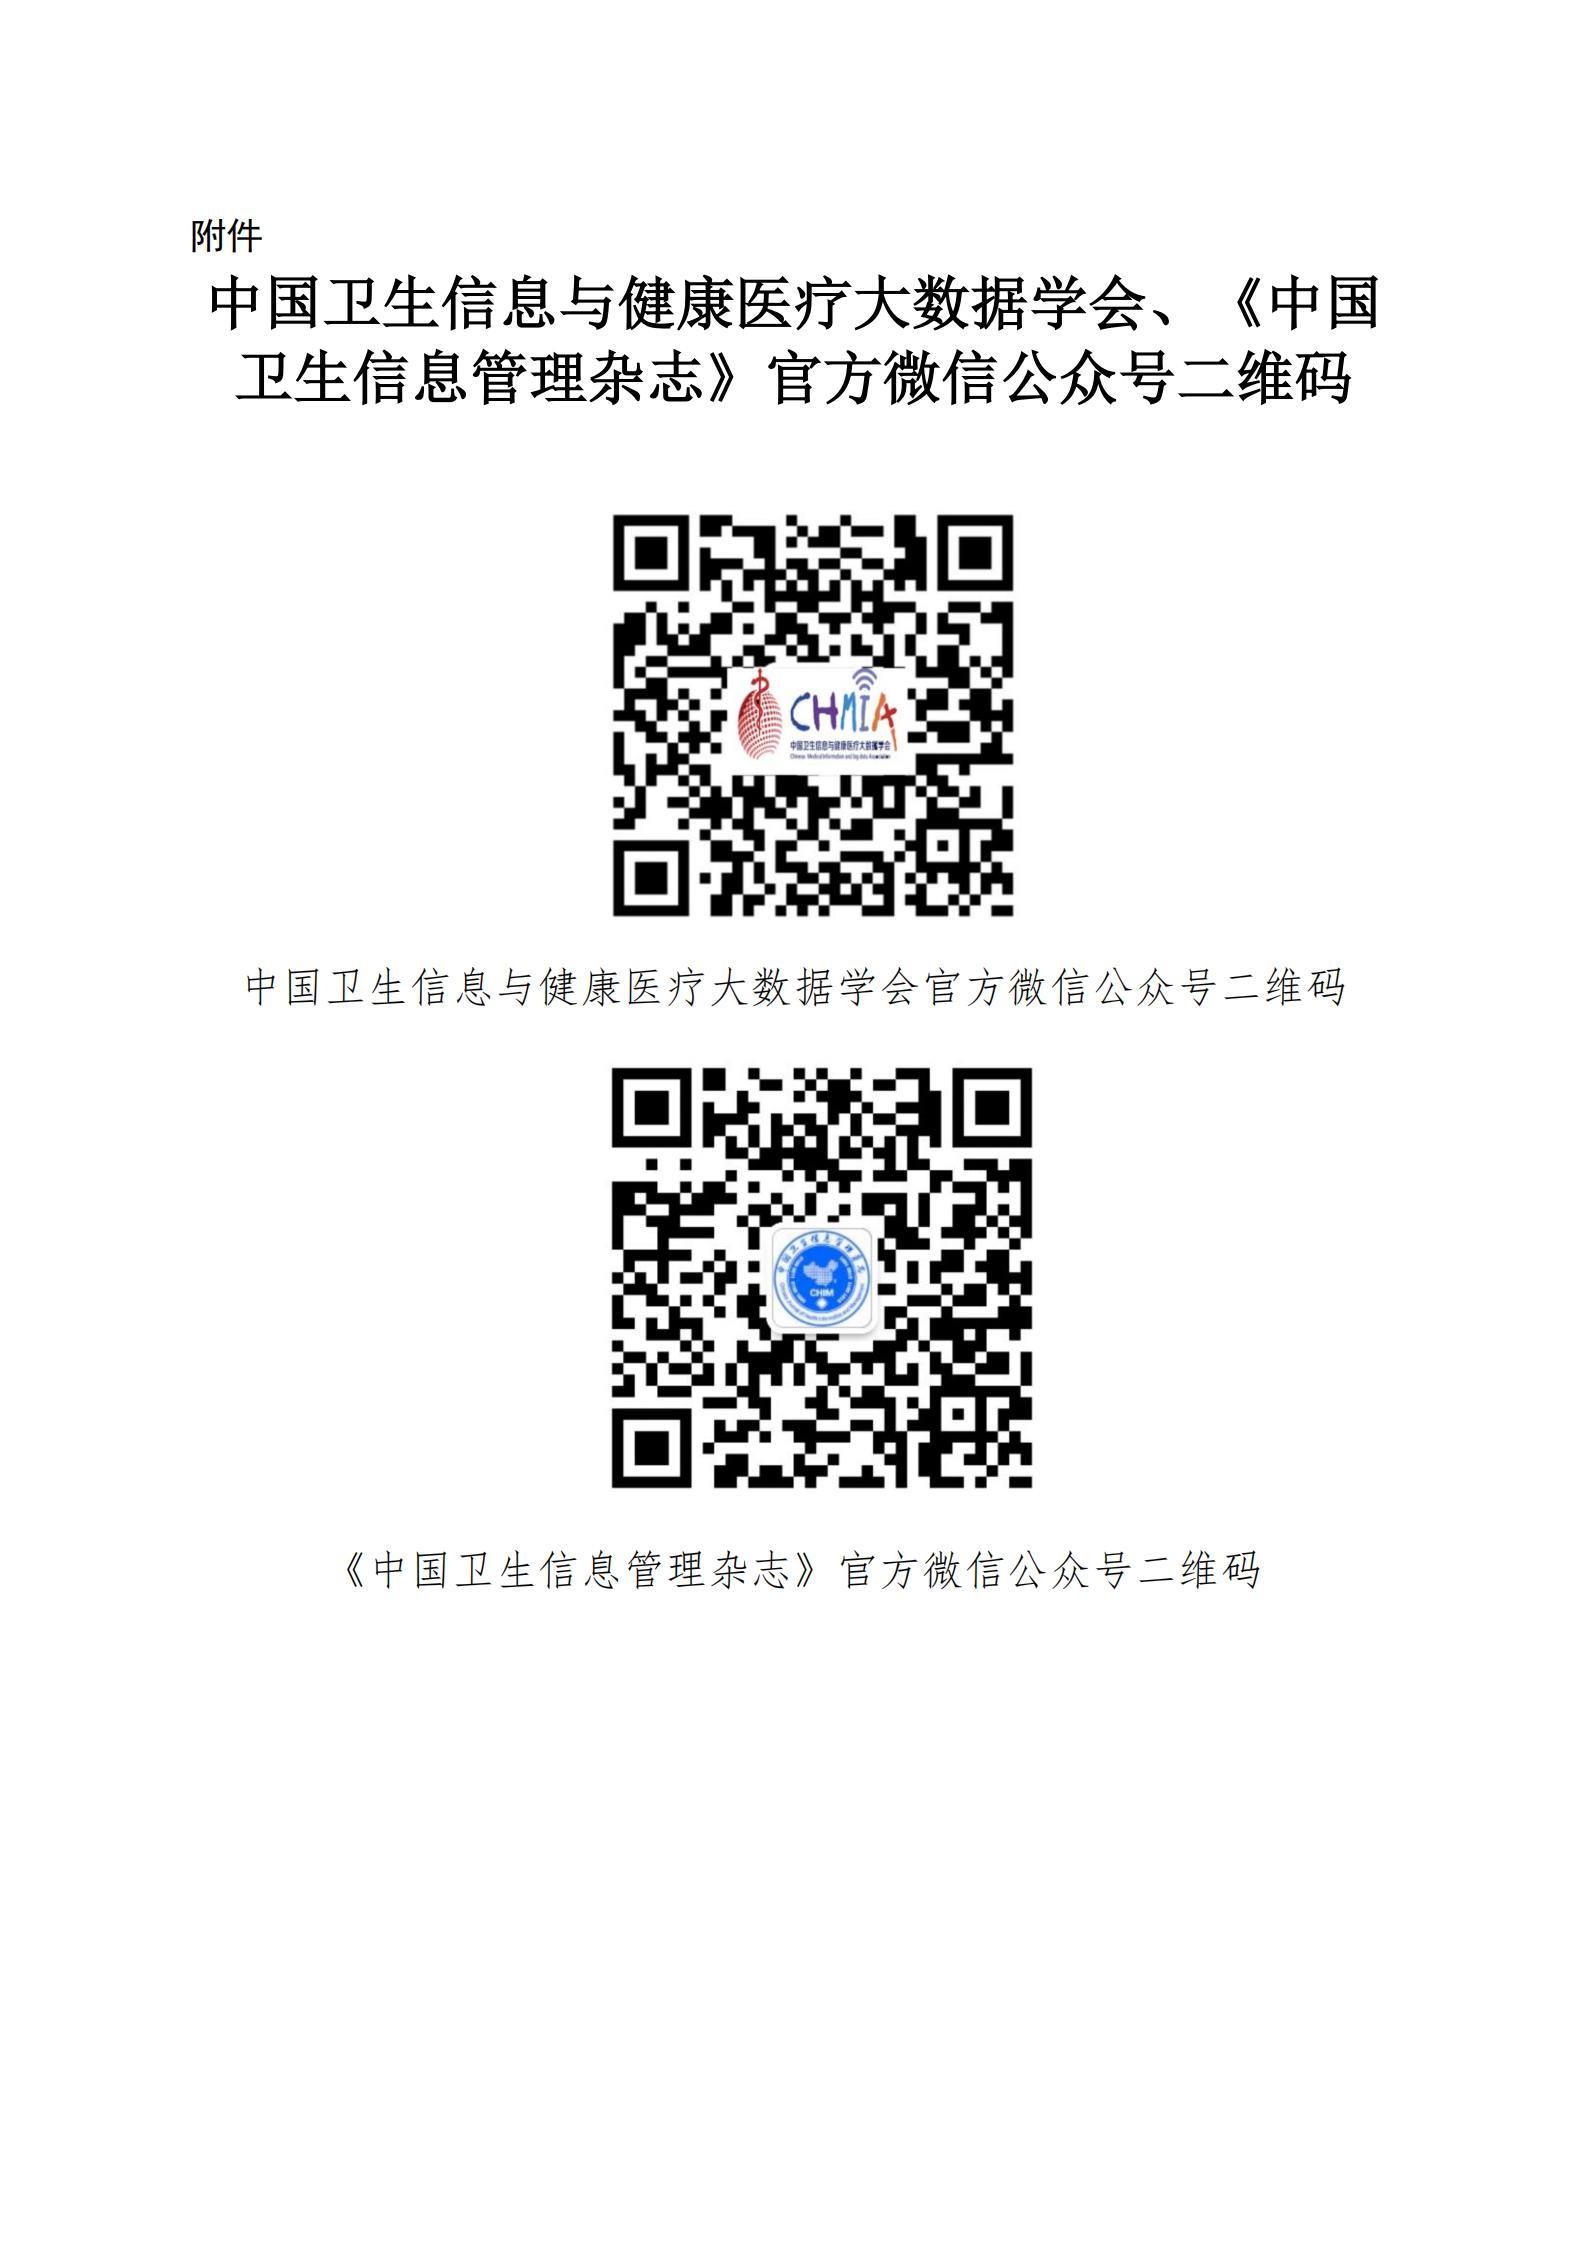 2020 CHIETC 大会通知_09.png